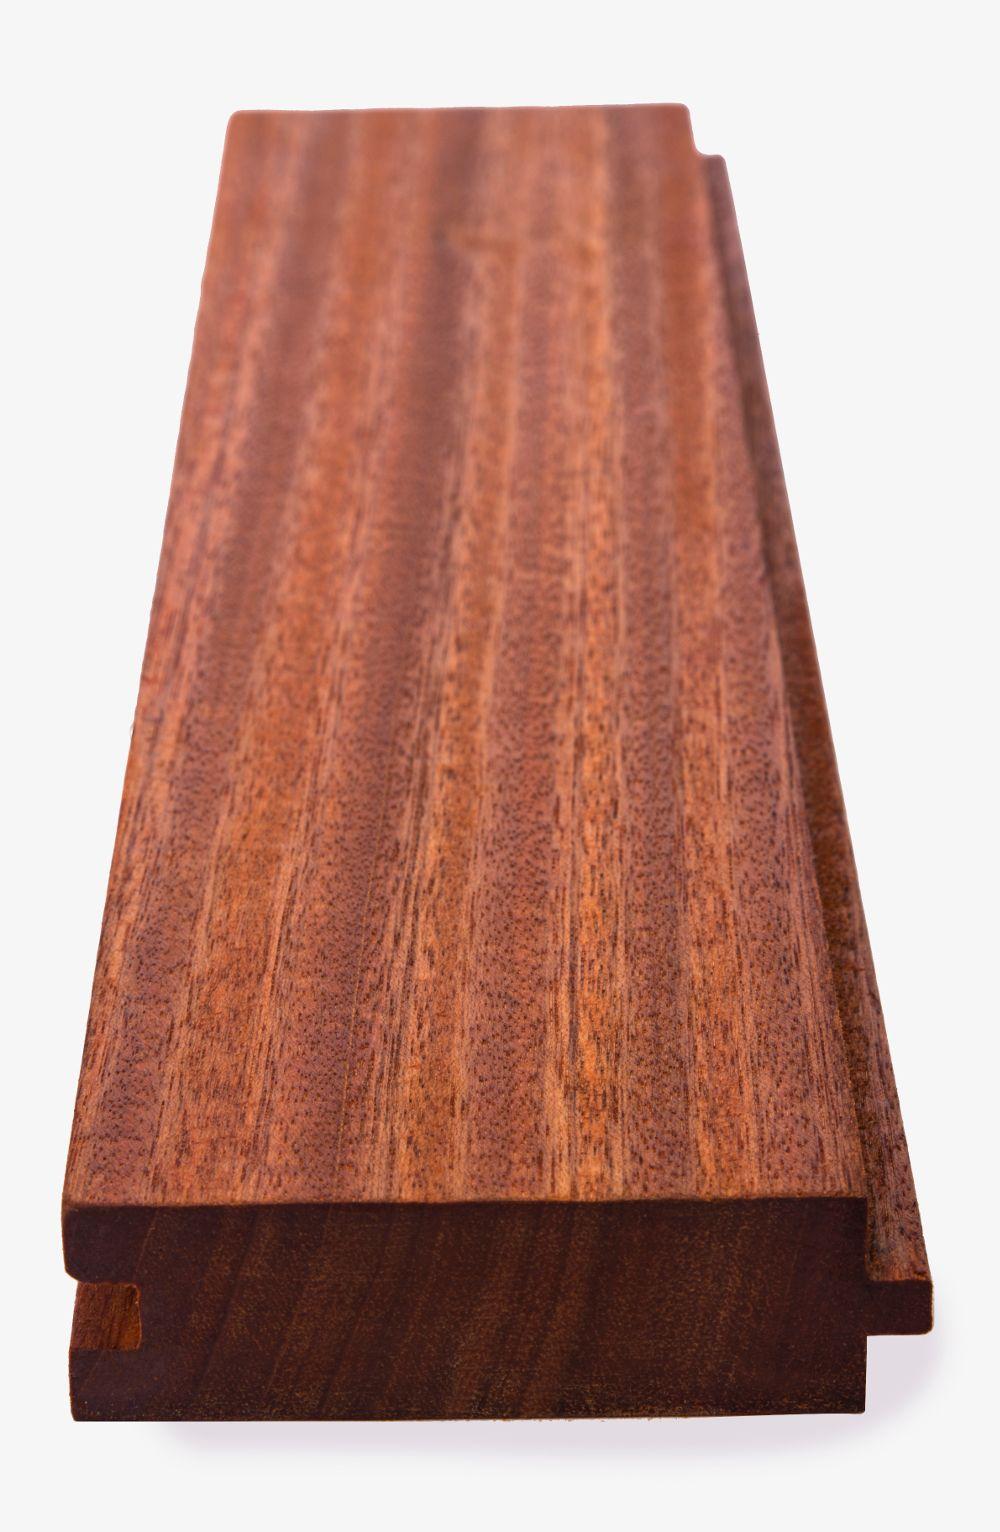 Batu Hardwood Tongue and Groove Porch Flooring by Nova USA